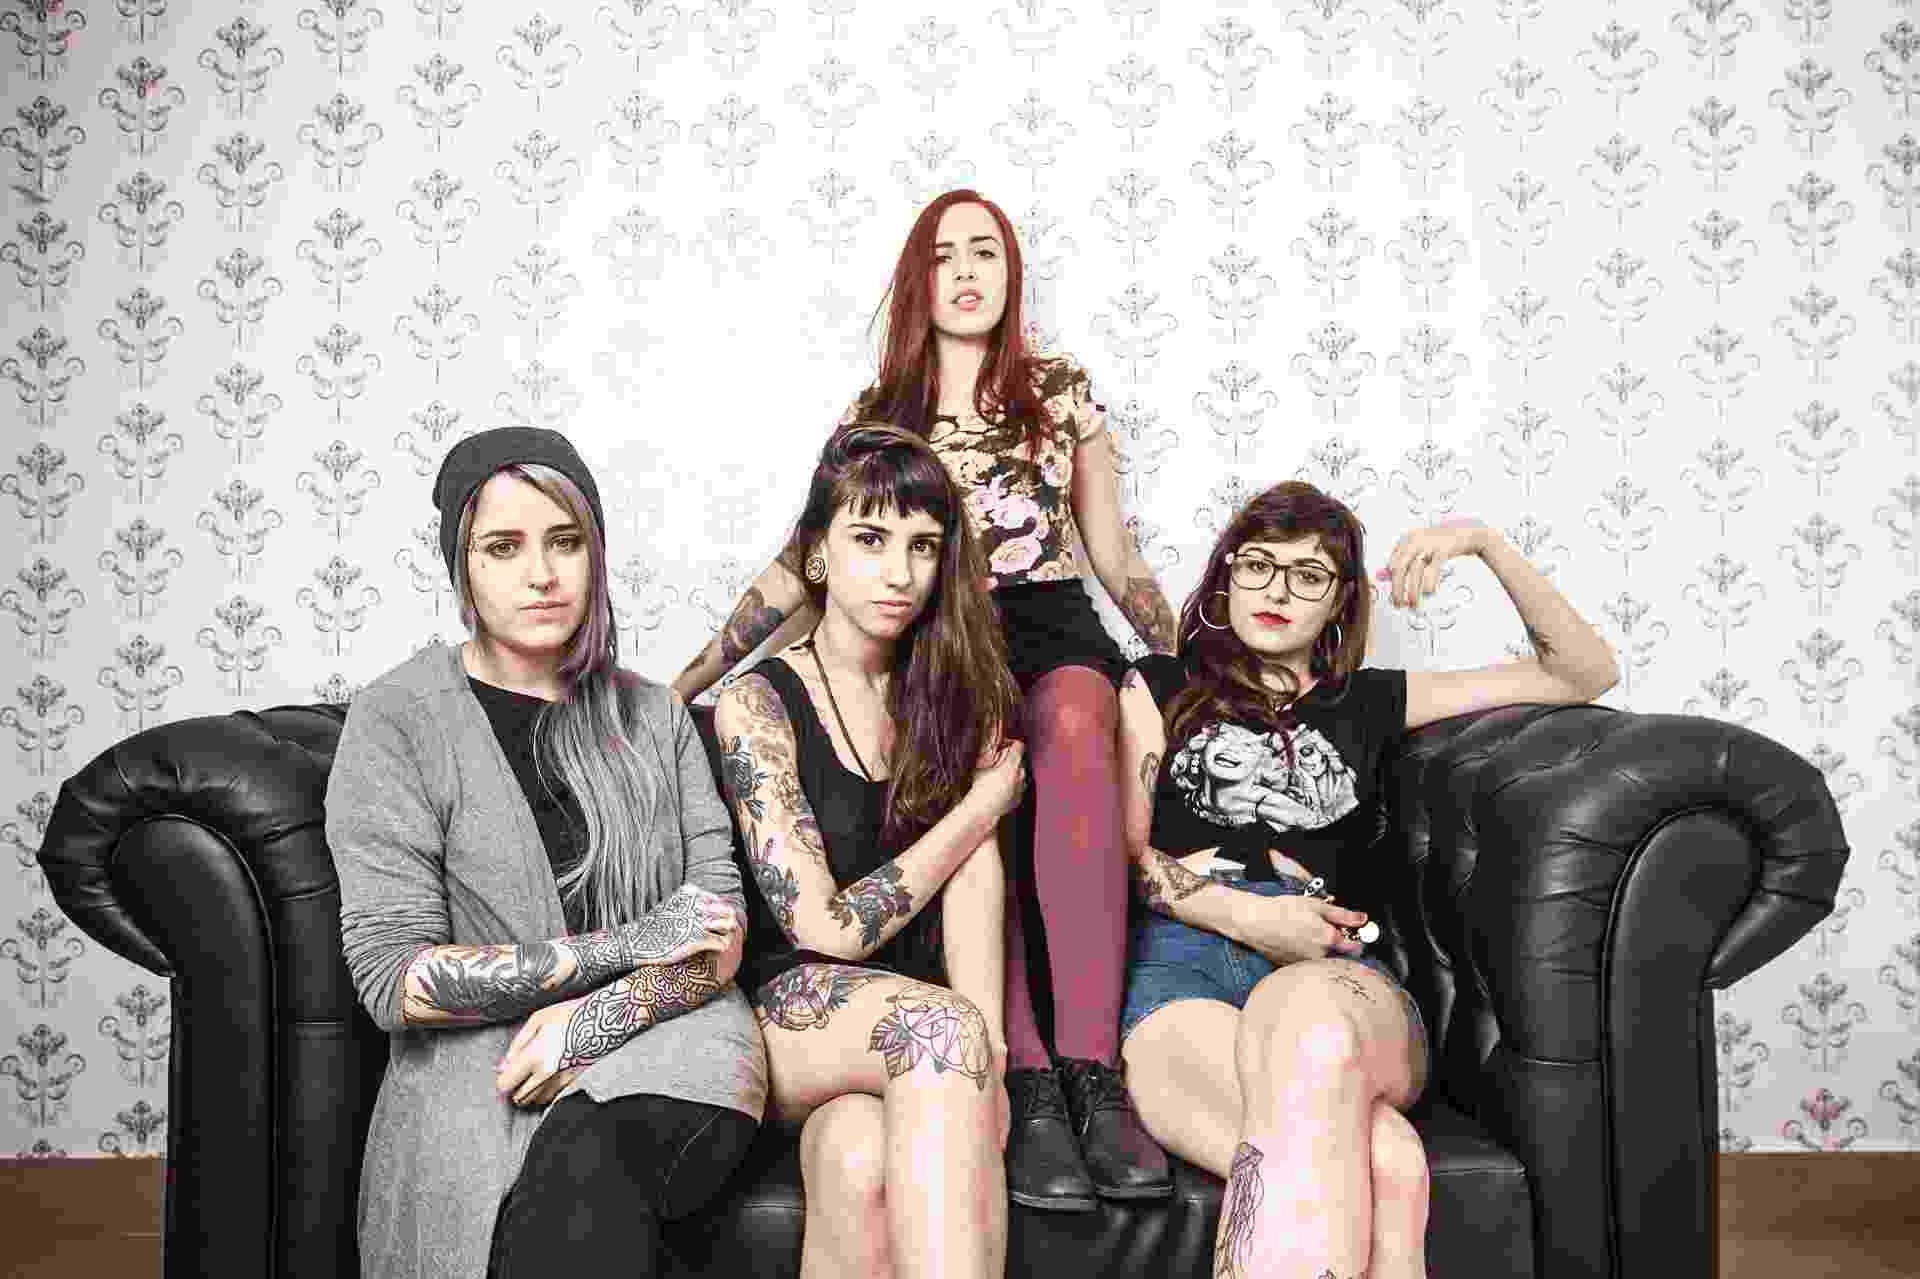 Tatuadoras feministas - Lucas Lima/UOL